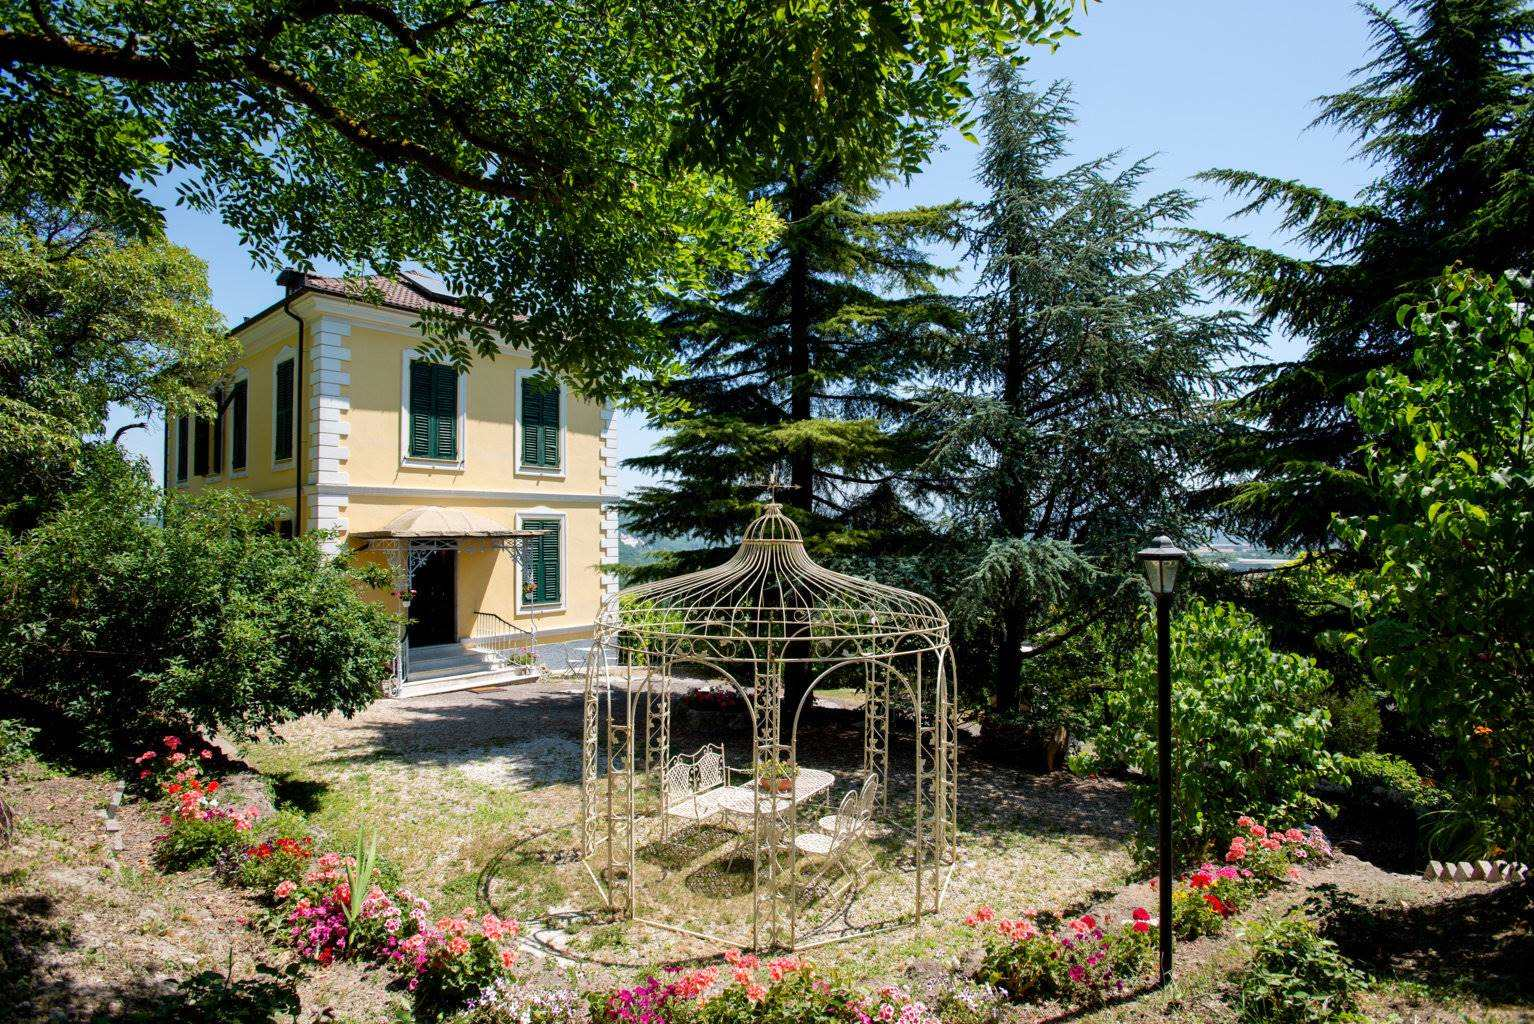 Villa con giardino a Serravalle Scrivia